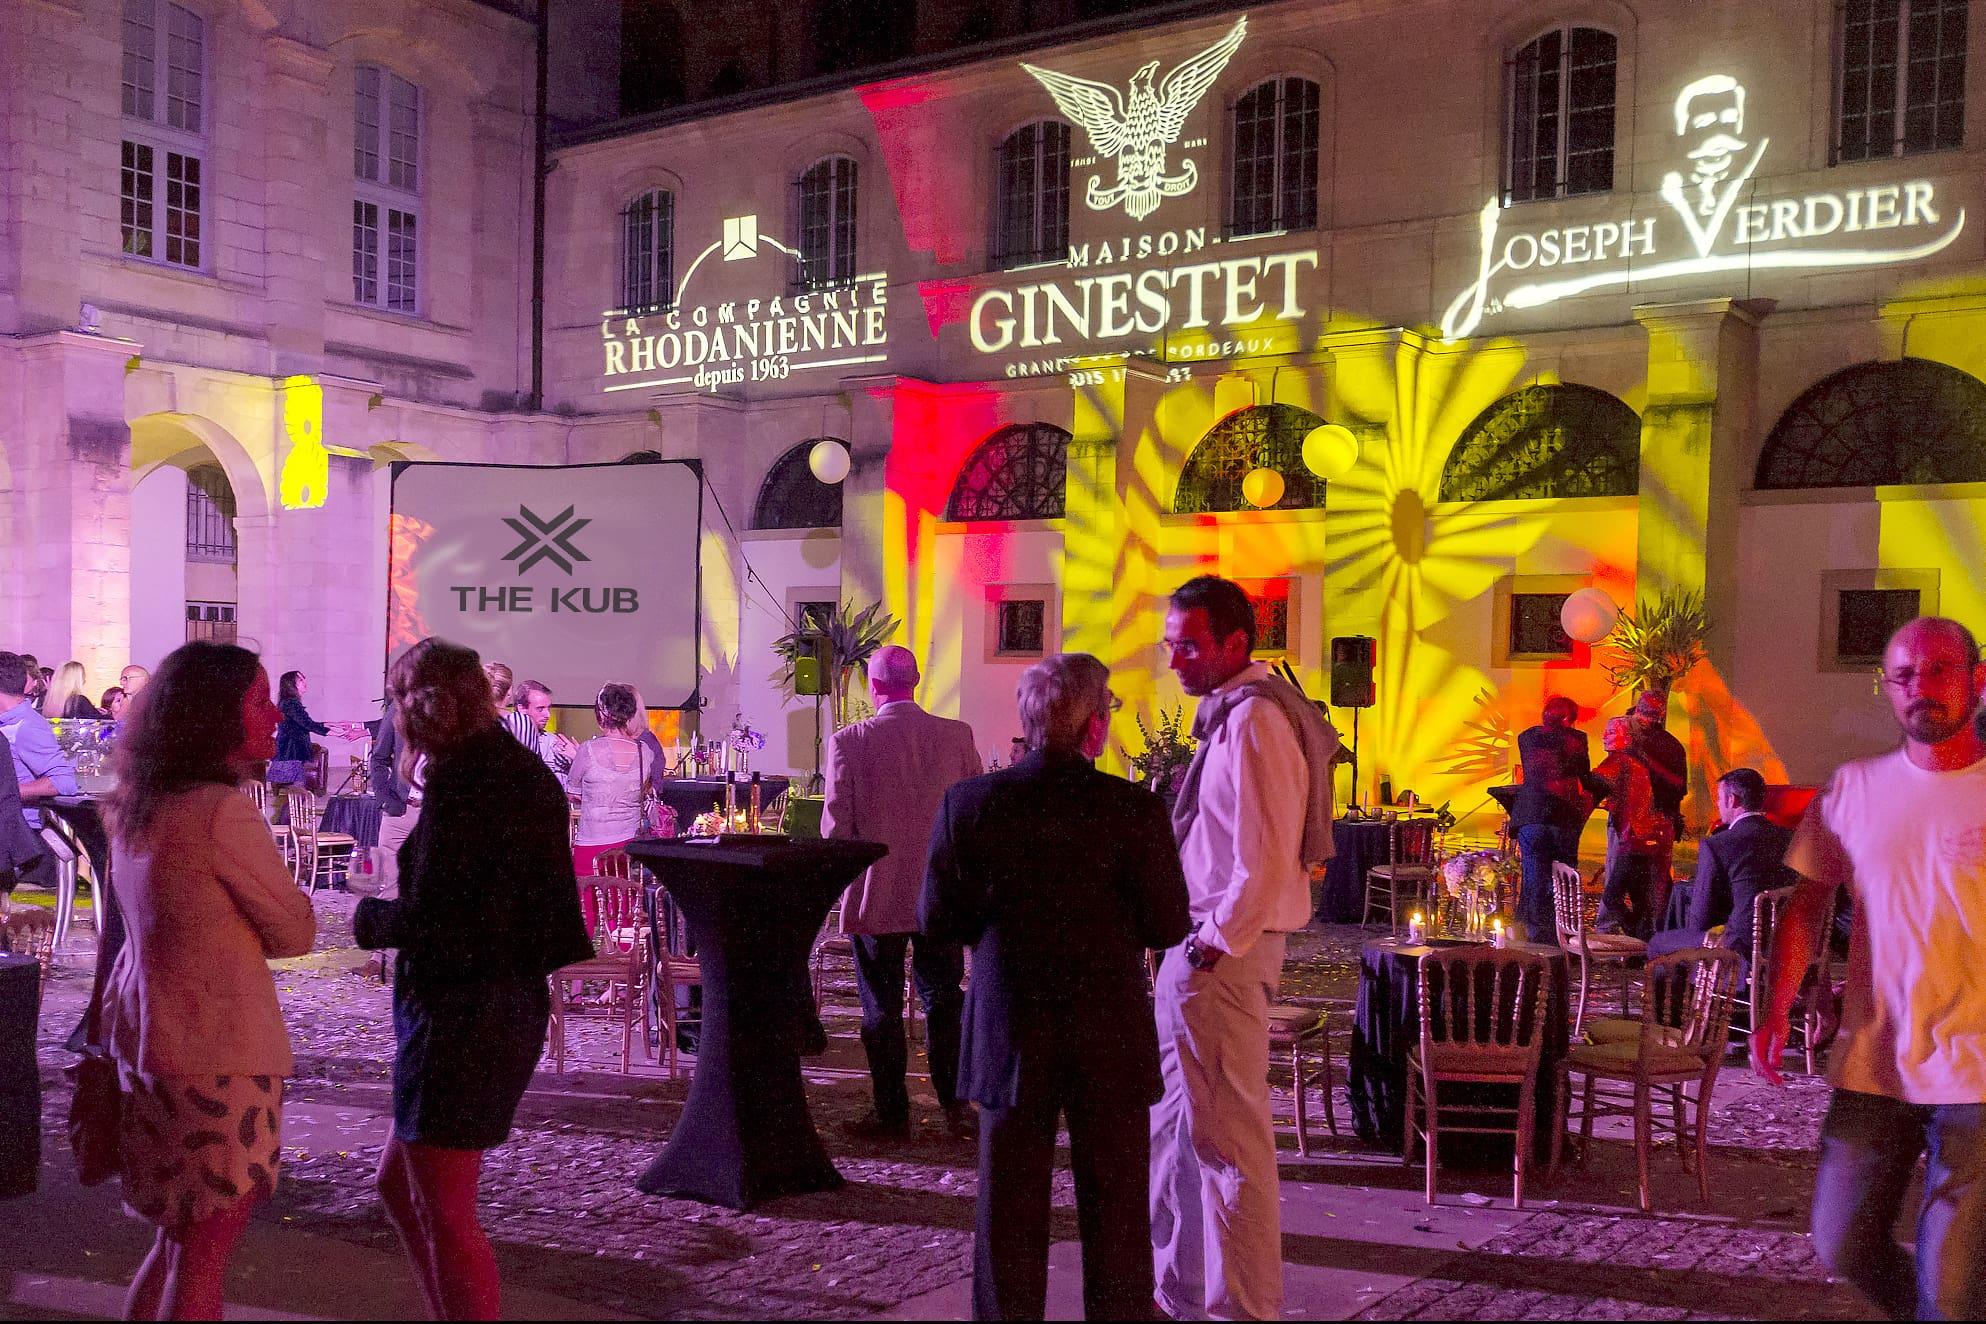 evenement soiree ginestet the kub mise en lumière